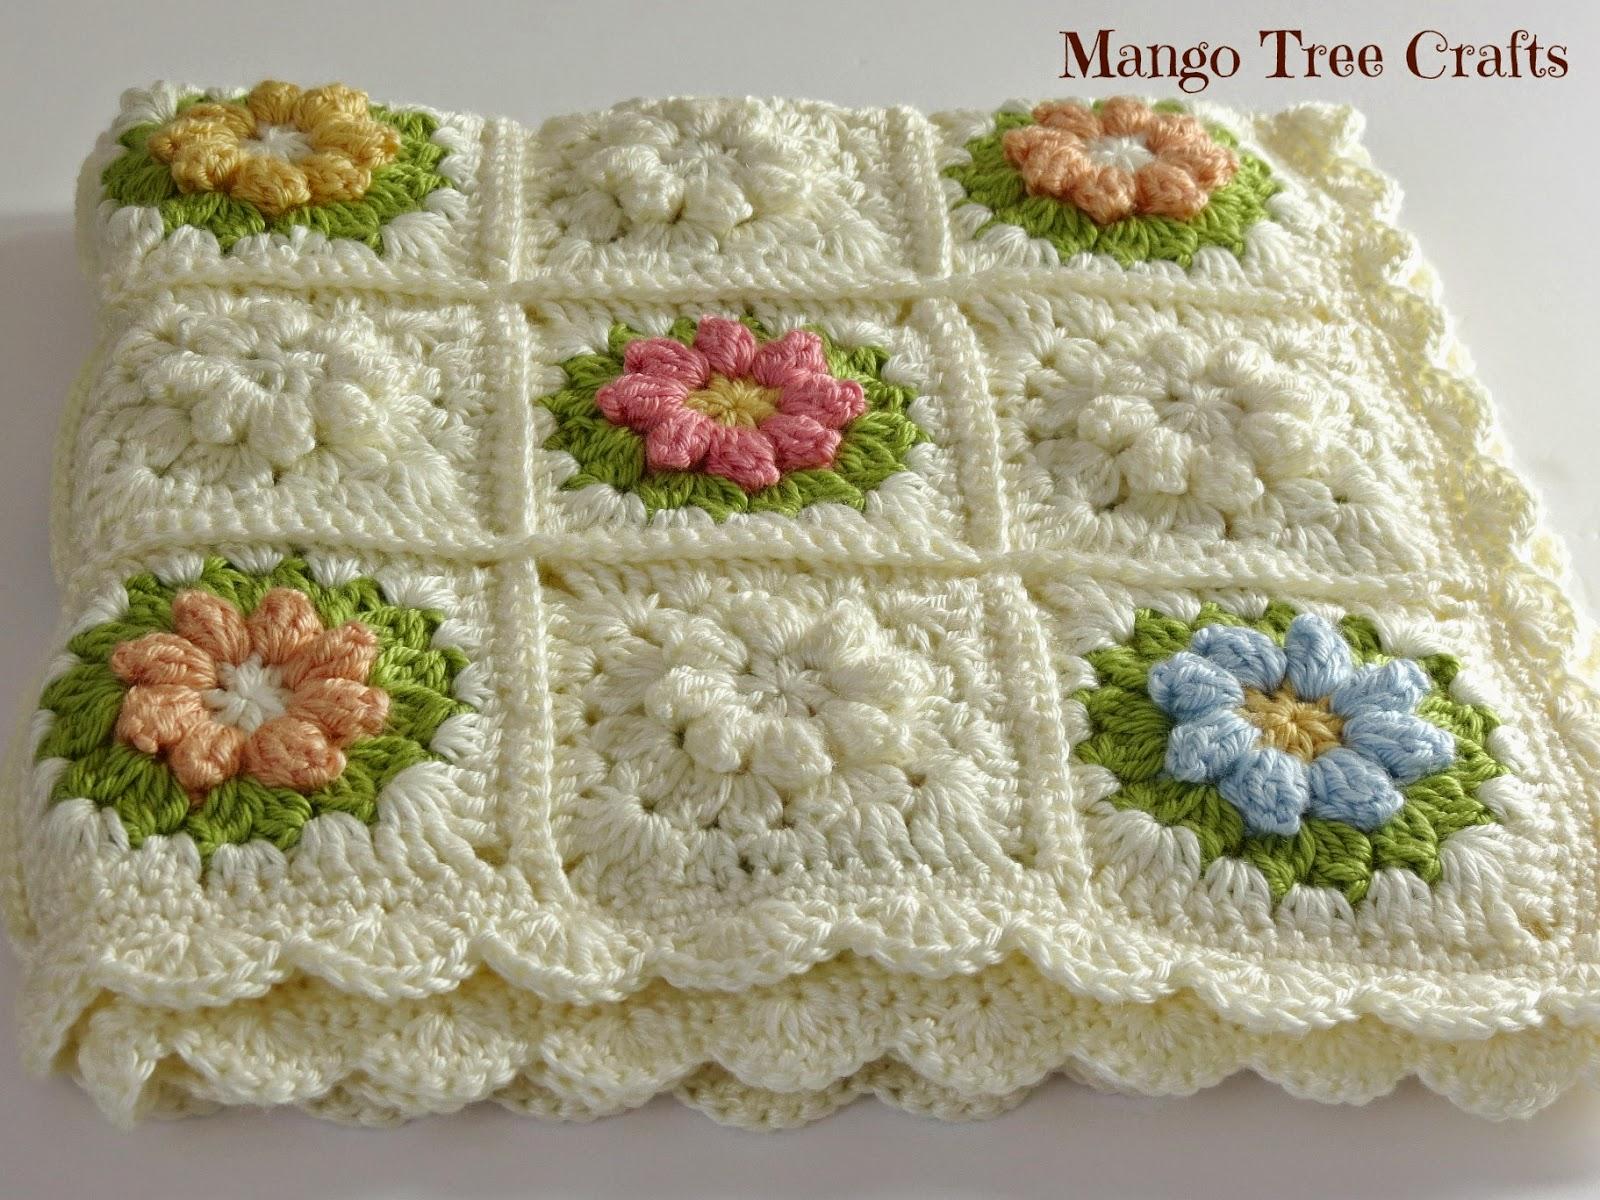 Mango Tree Crafts Crochet Baby Blanket